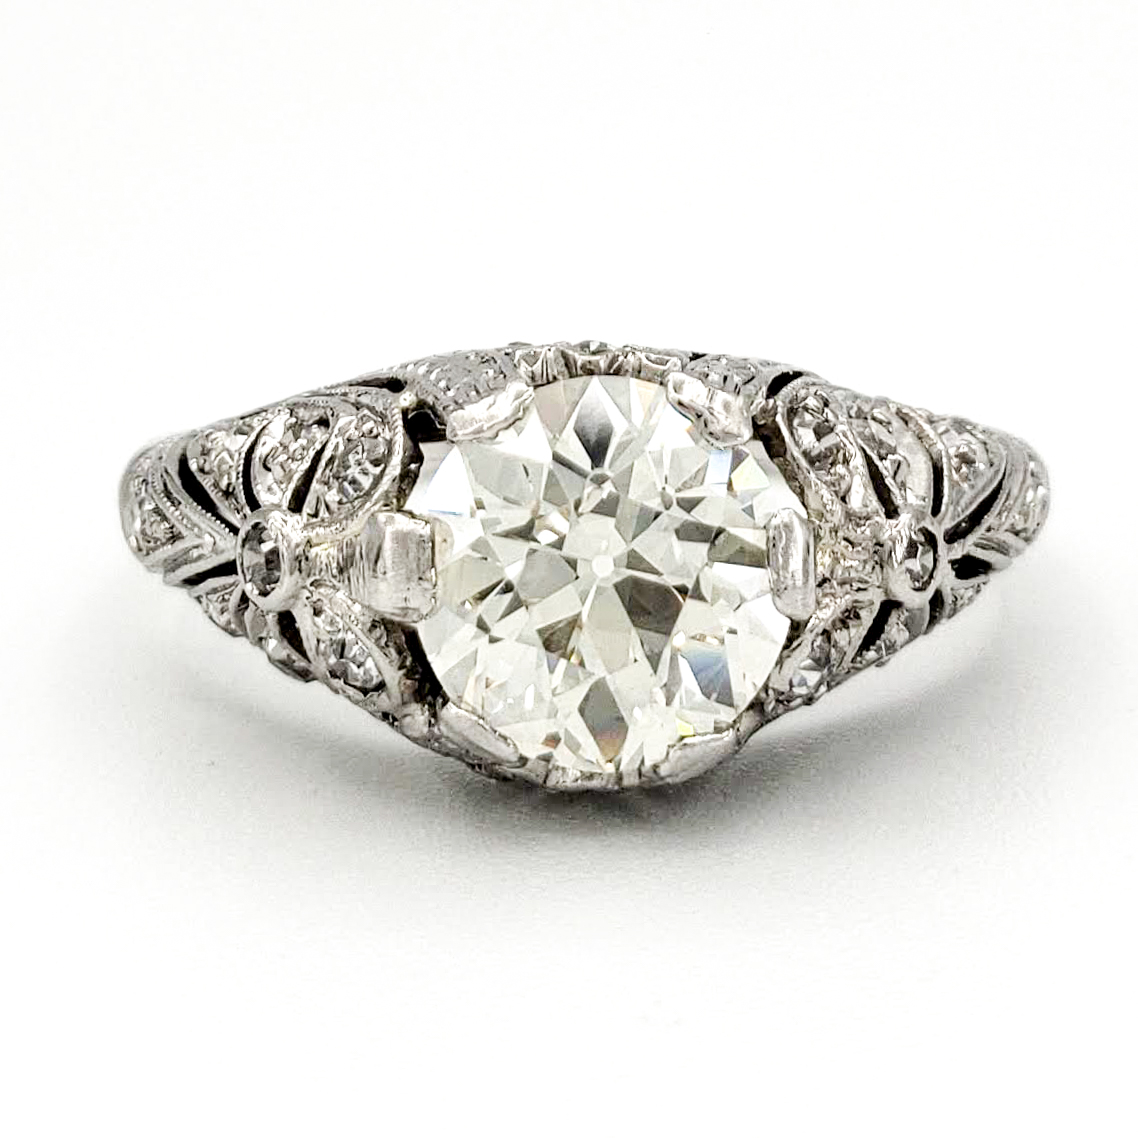 vintage-platinum-engagement-ring-with-1-48-carat-old-european-cut-diamond-egl-k-vs1